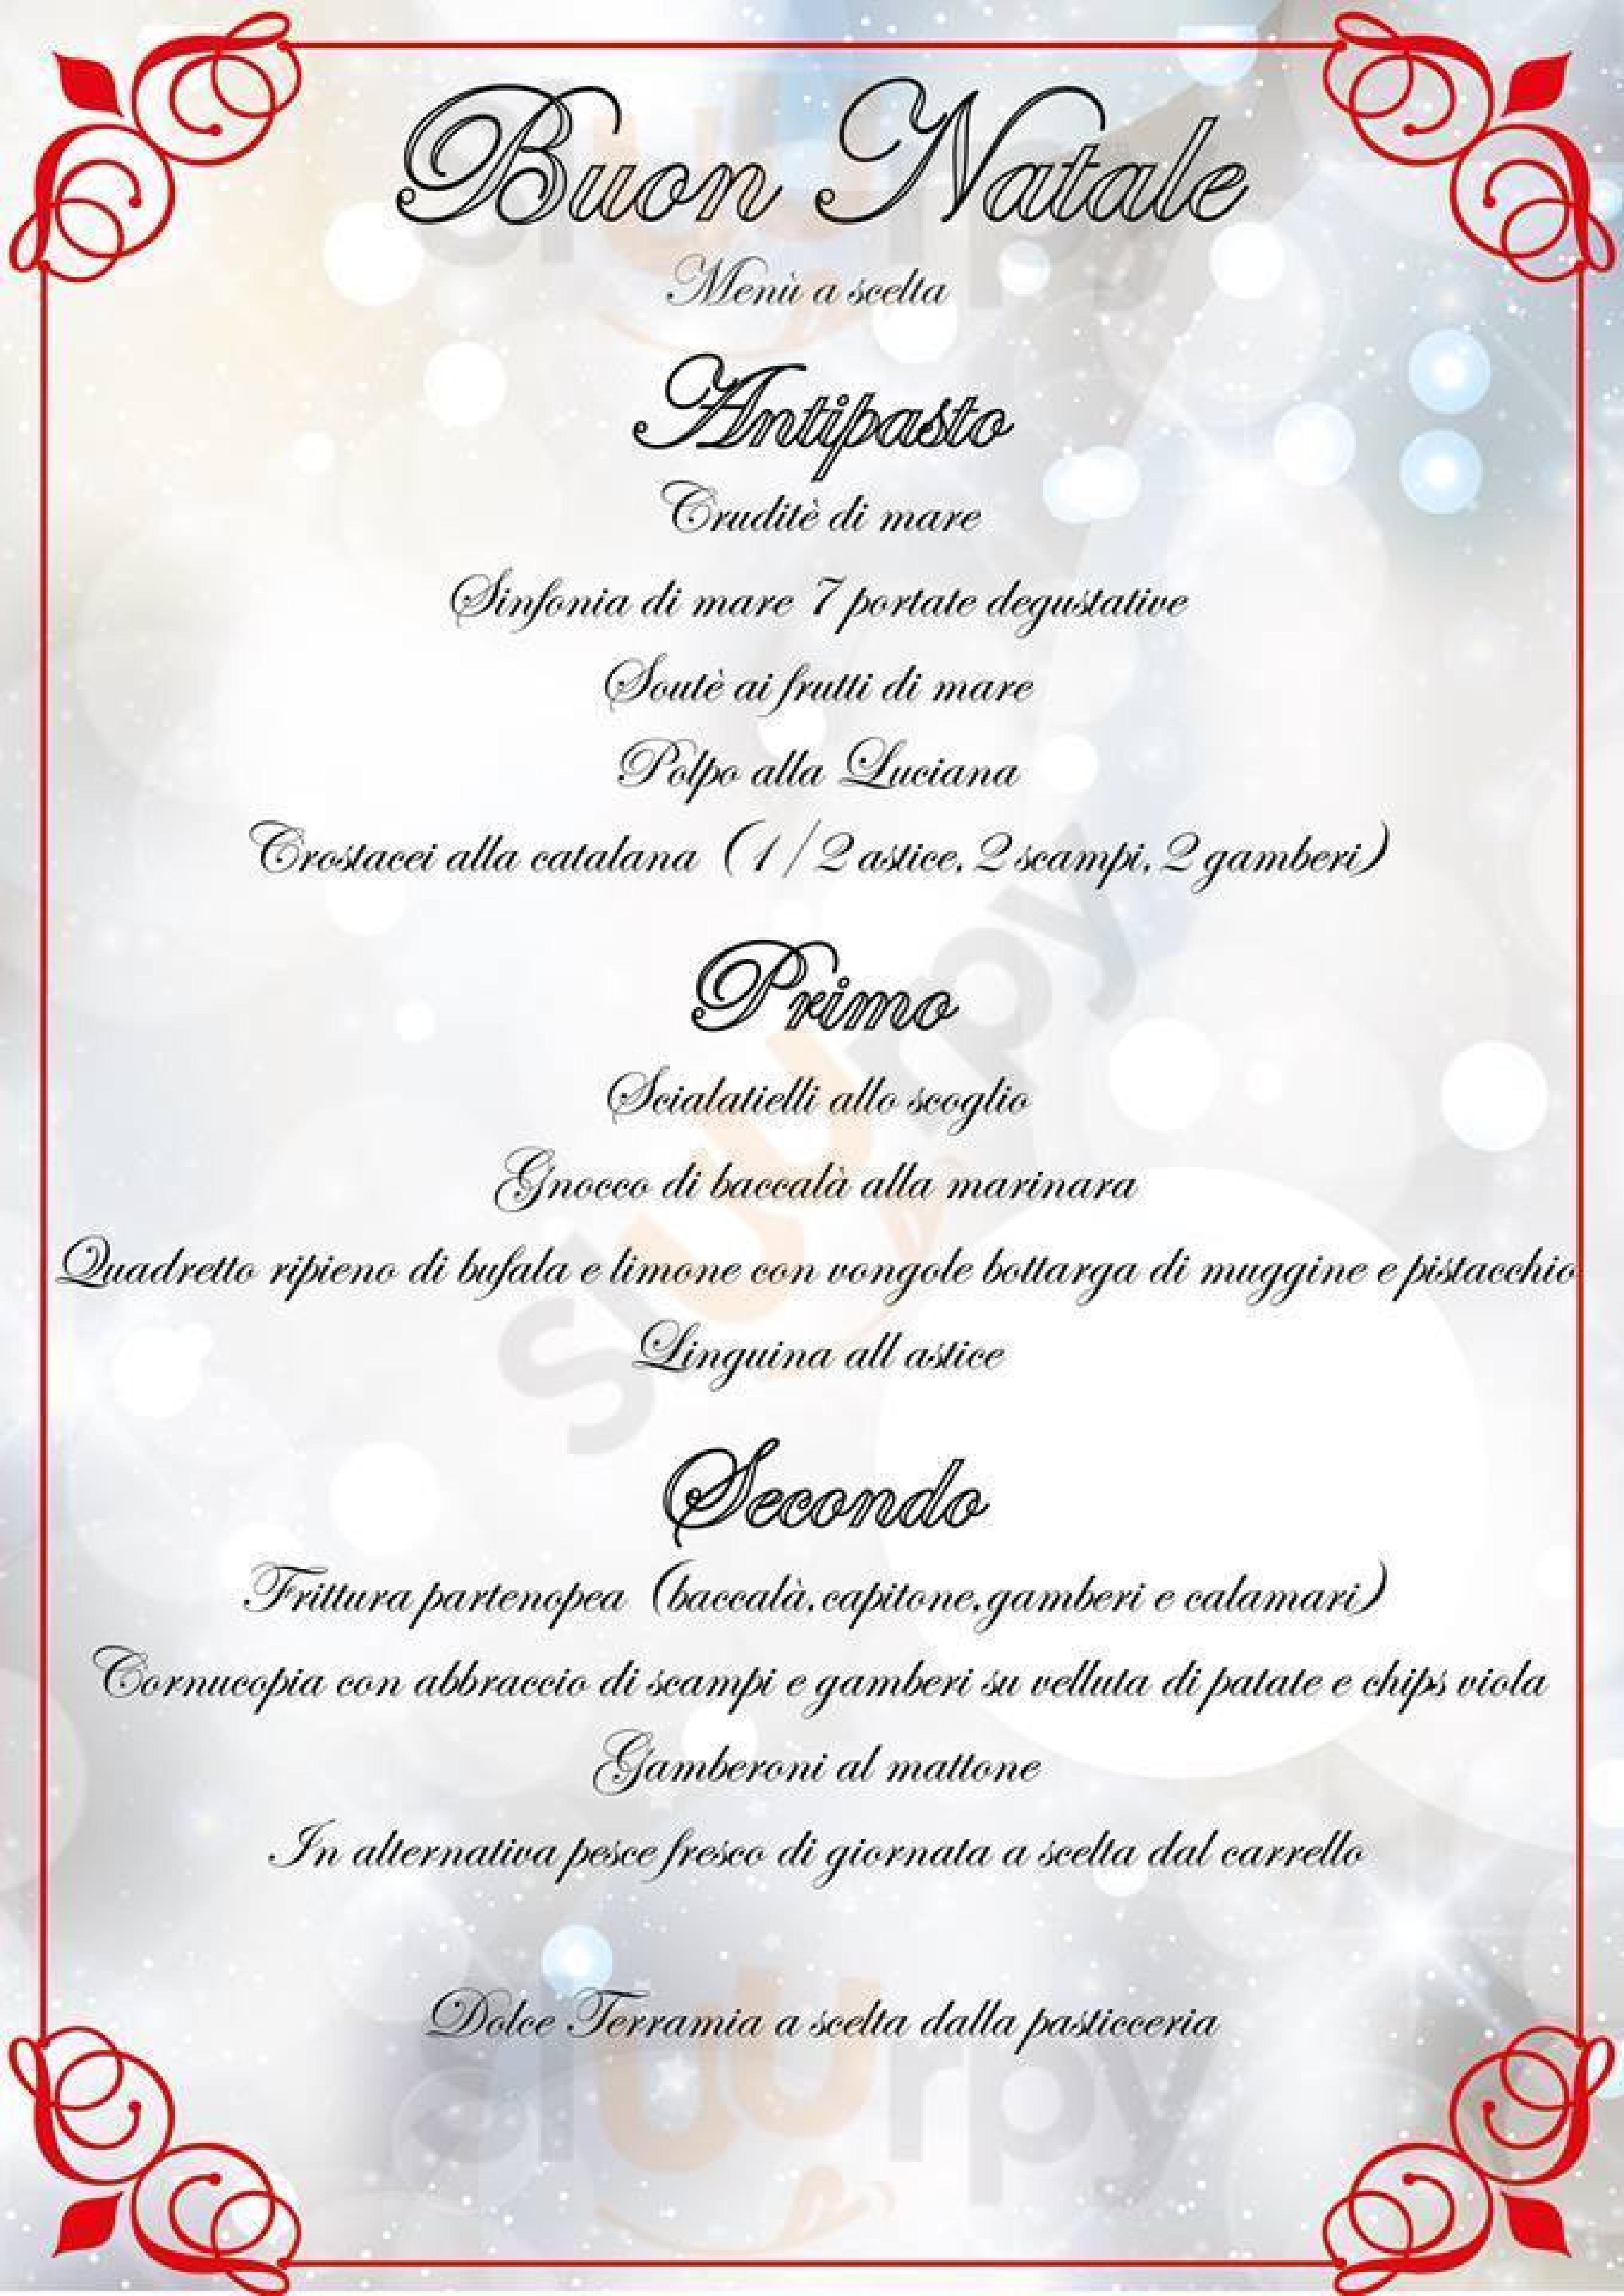 terramia ristorante mediterraneo Trento menù 1 pagina